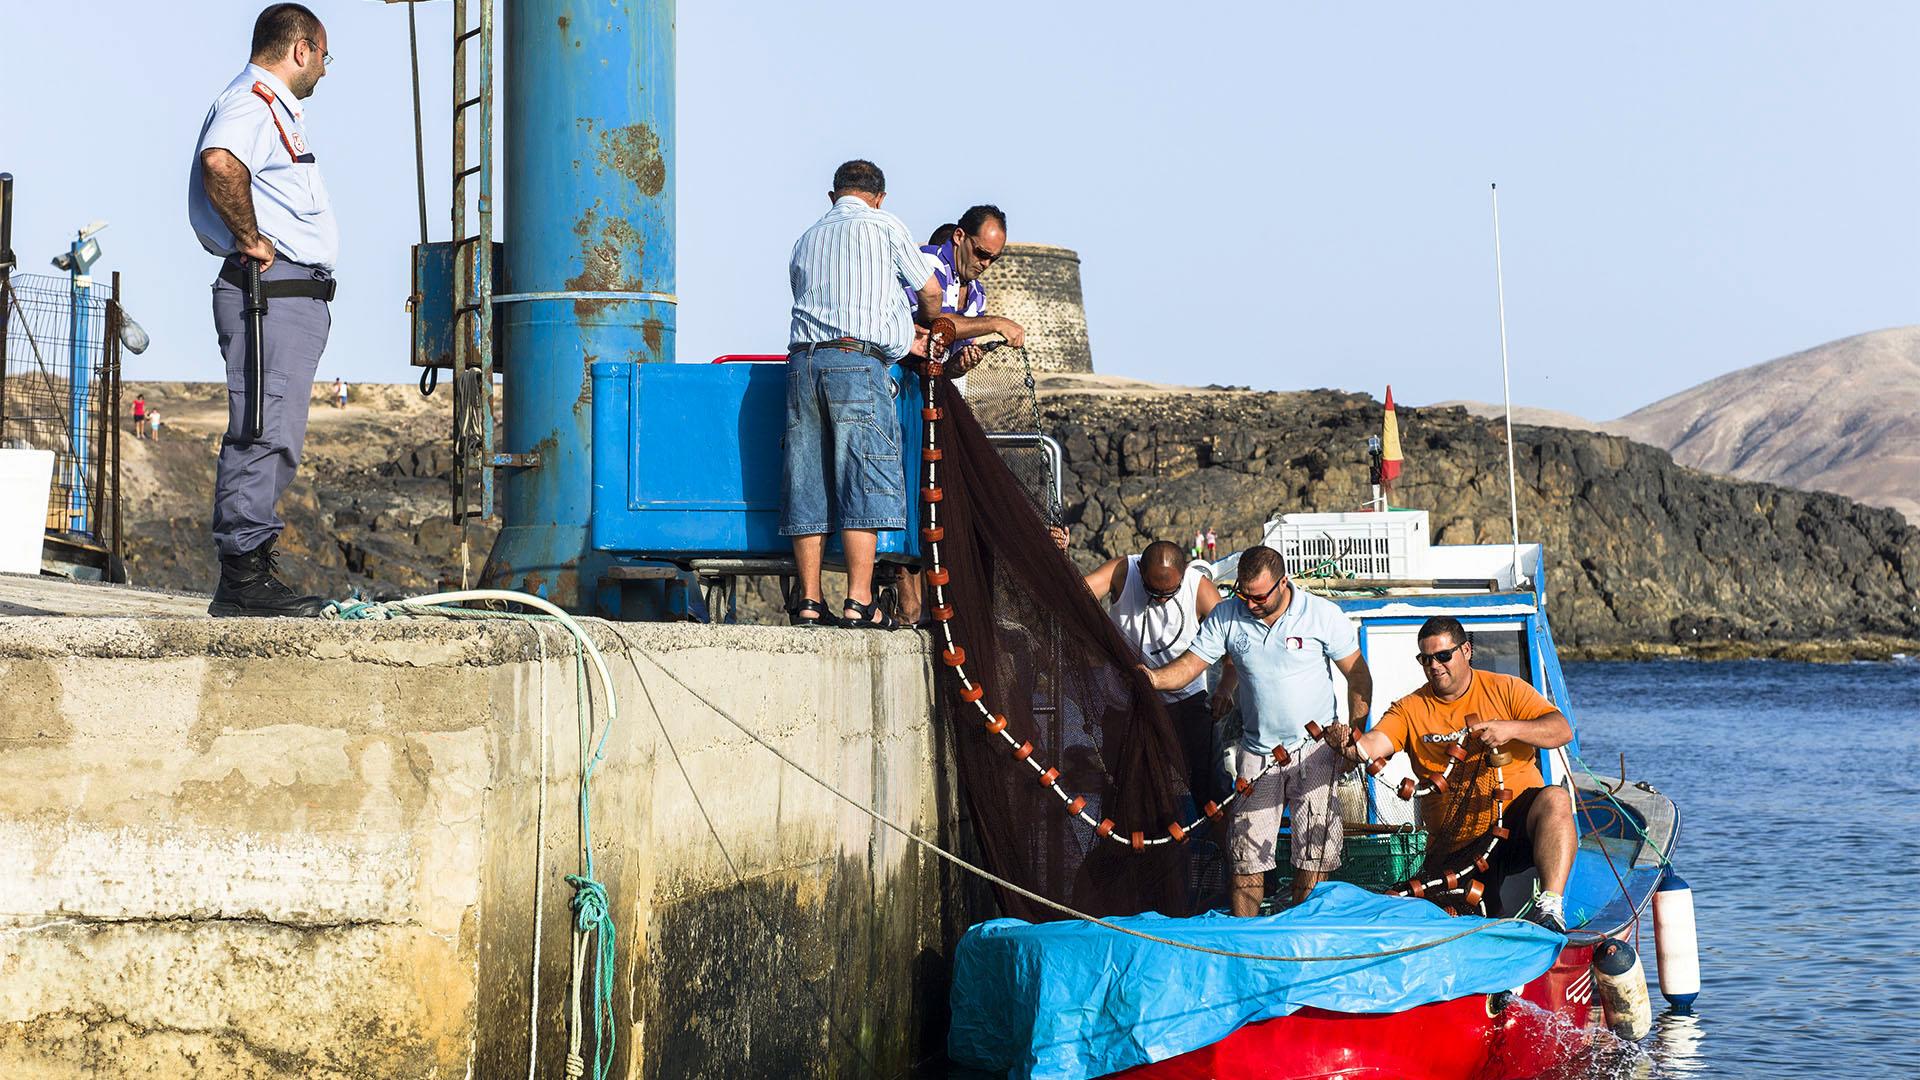 Handels-Hafen El Cotillo Fuerteventura – www.sunnyfuerte.com